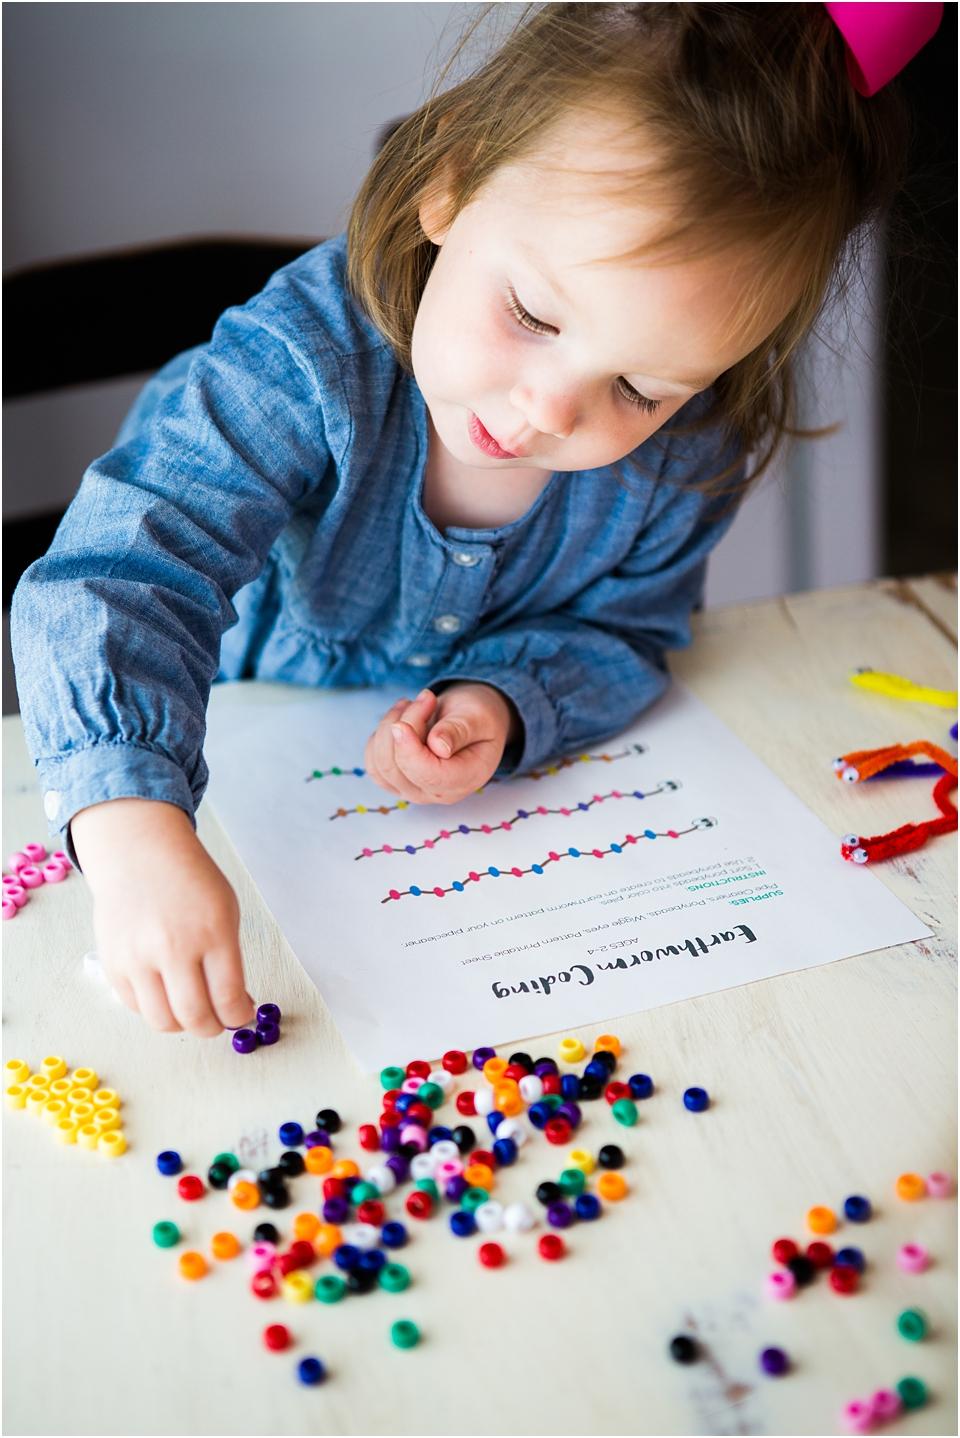 free printable #STEAM #Preschool #preschooler #freeprintable #printable #earthwormactivity #screenfree #preschool #stemkids #stem